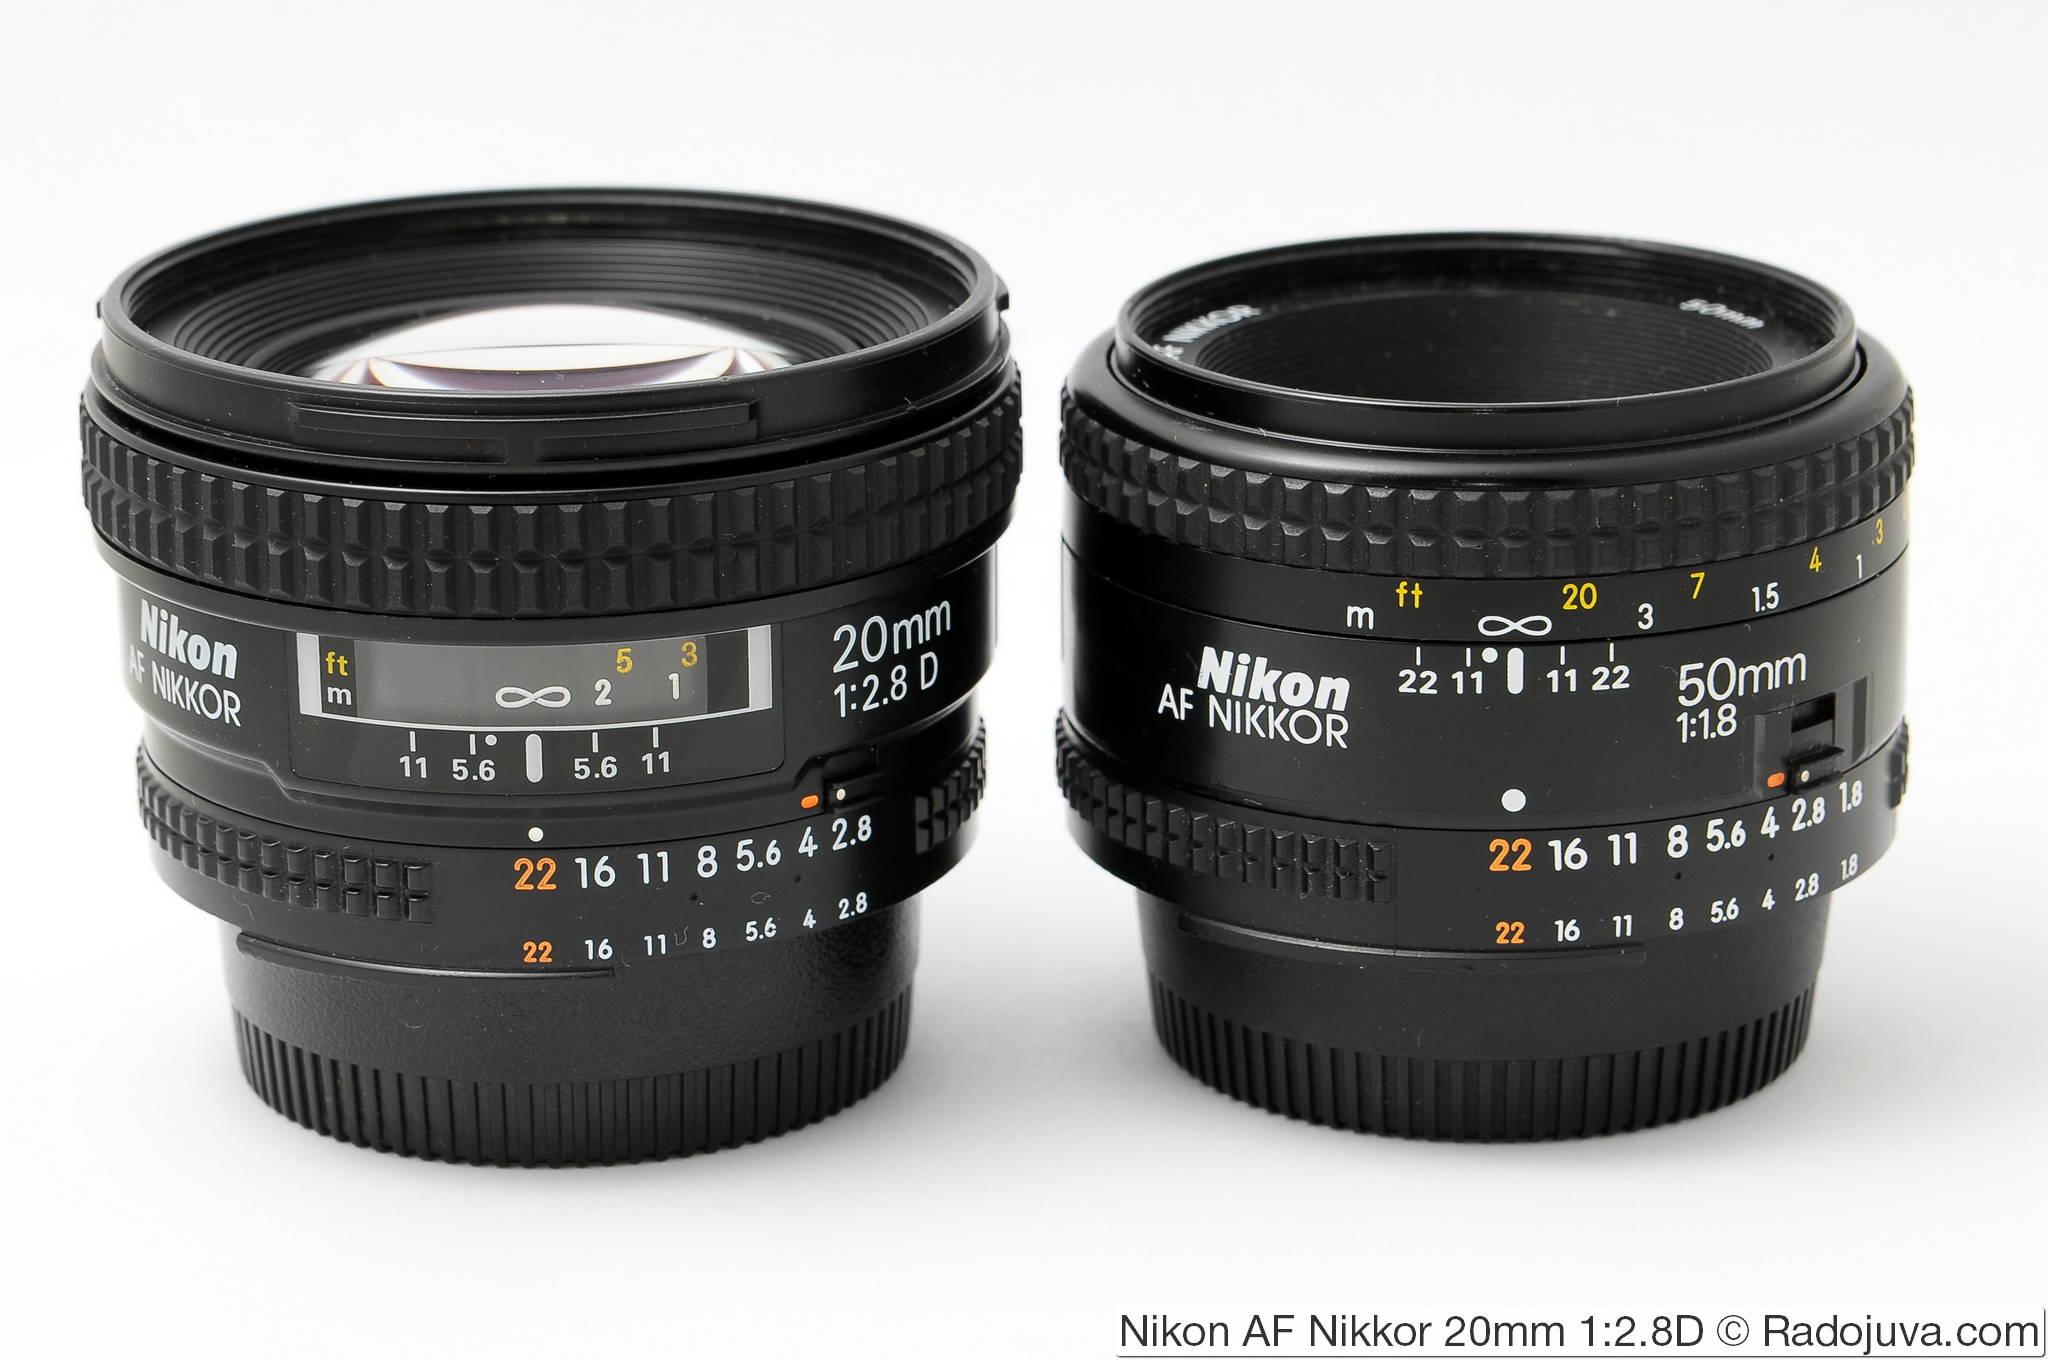 Размеры Nikon 20/2.8D и Nikon AF Nikkor 50mm 1:1.8